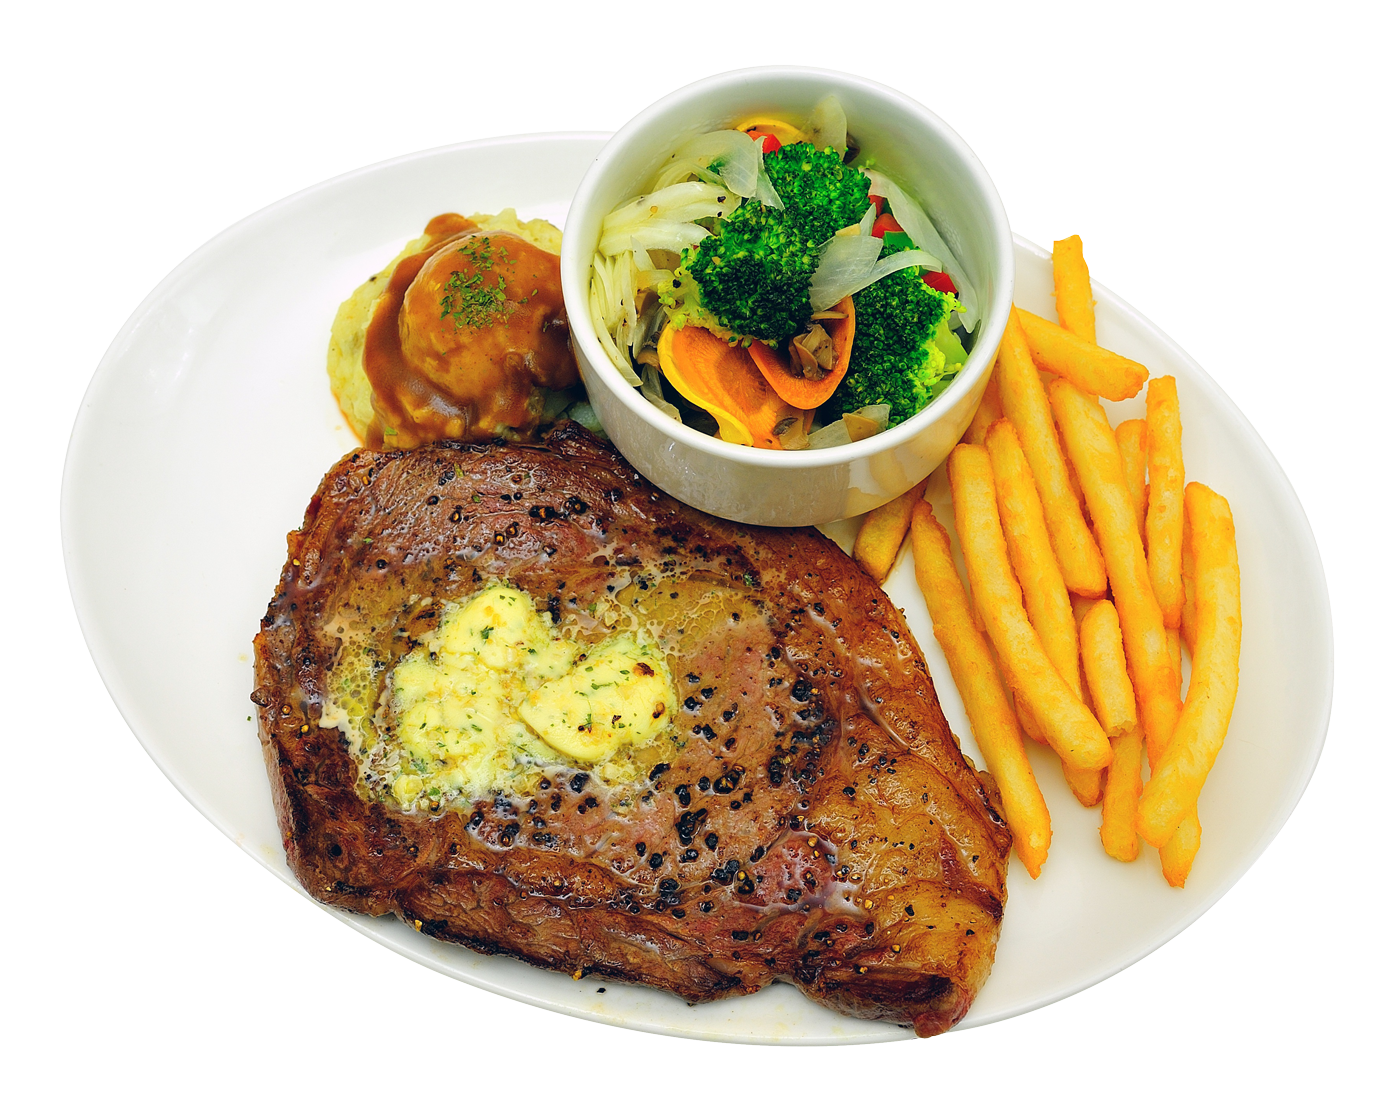 Food Plate PNG Image - PurePNG | Free transparent CC0 PNG ...